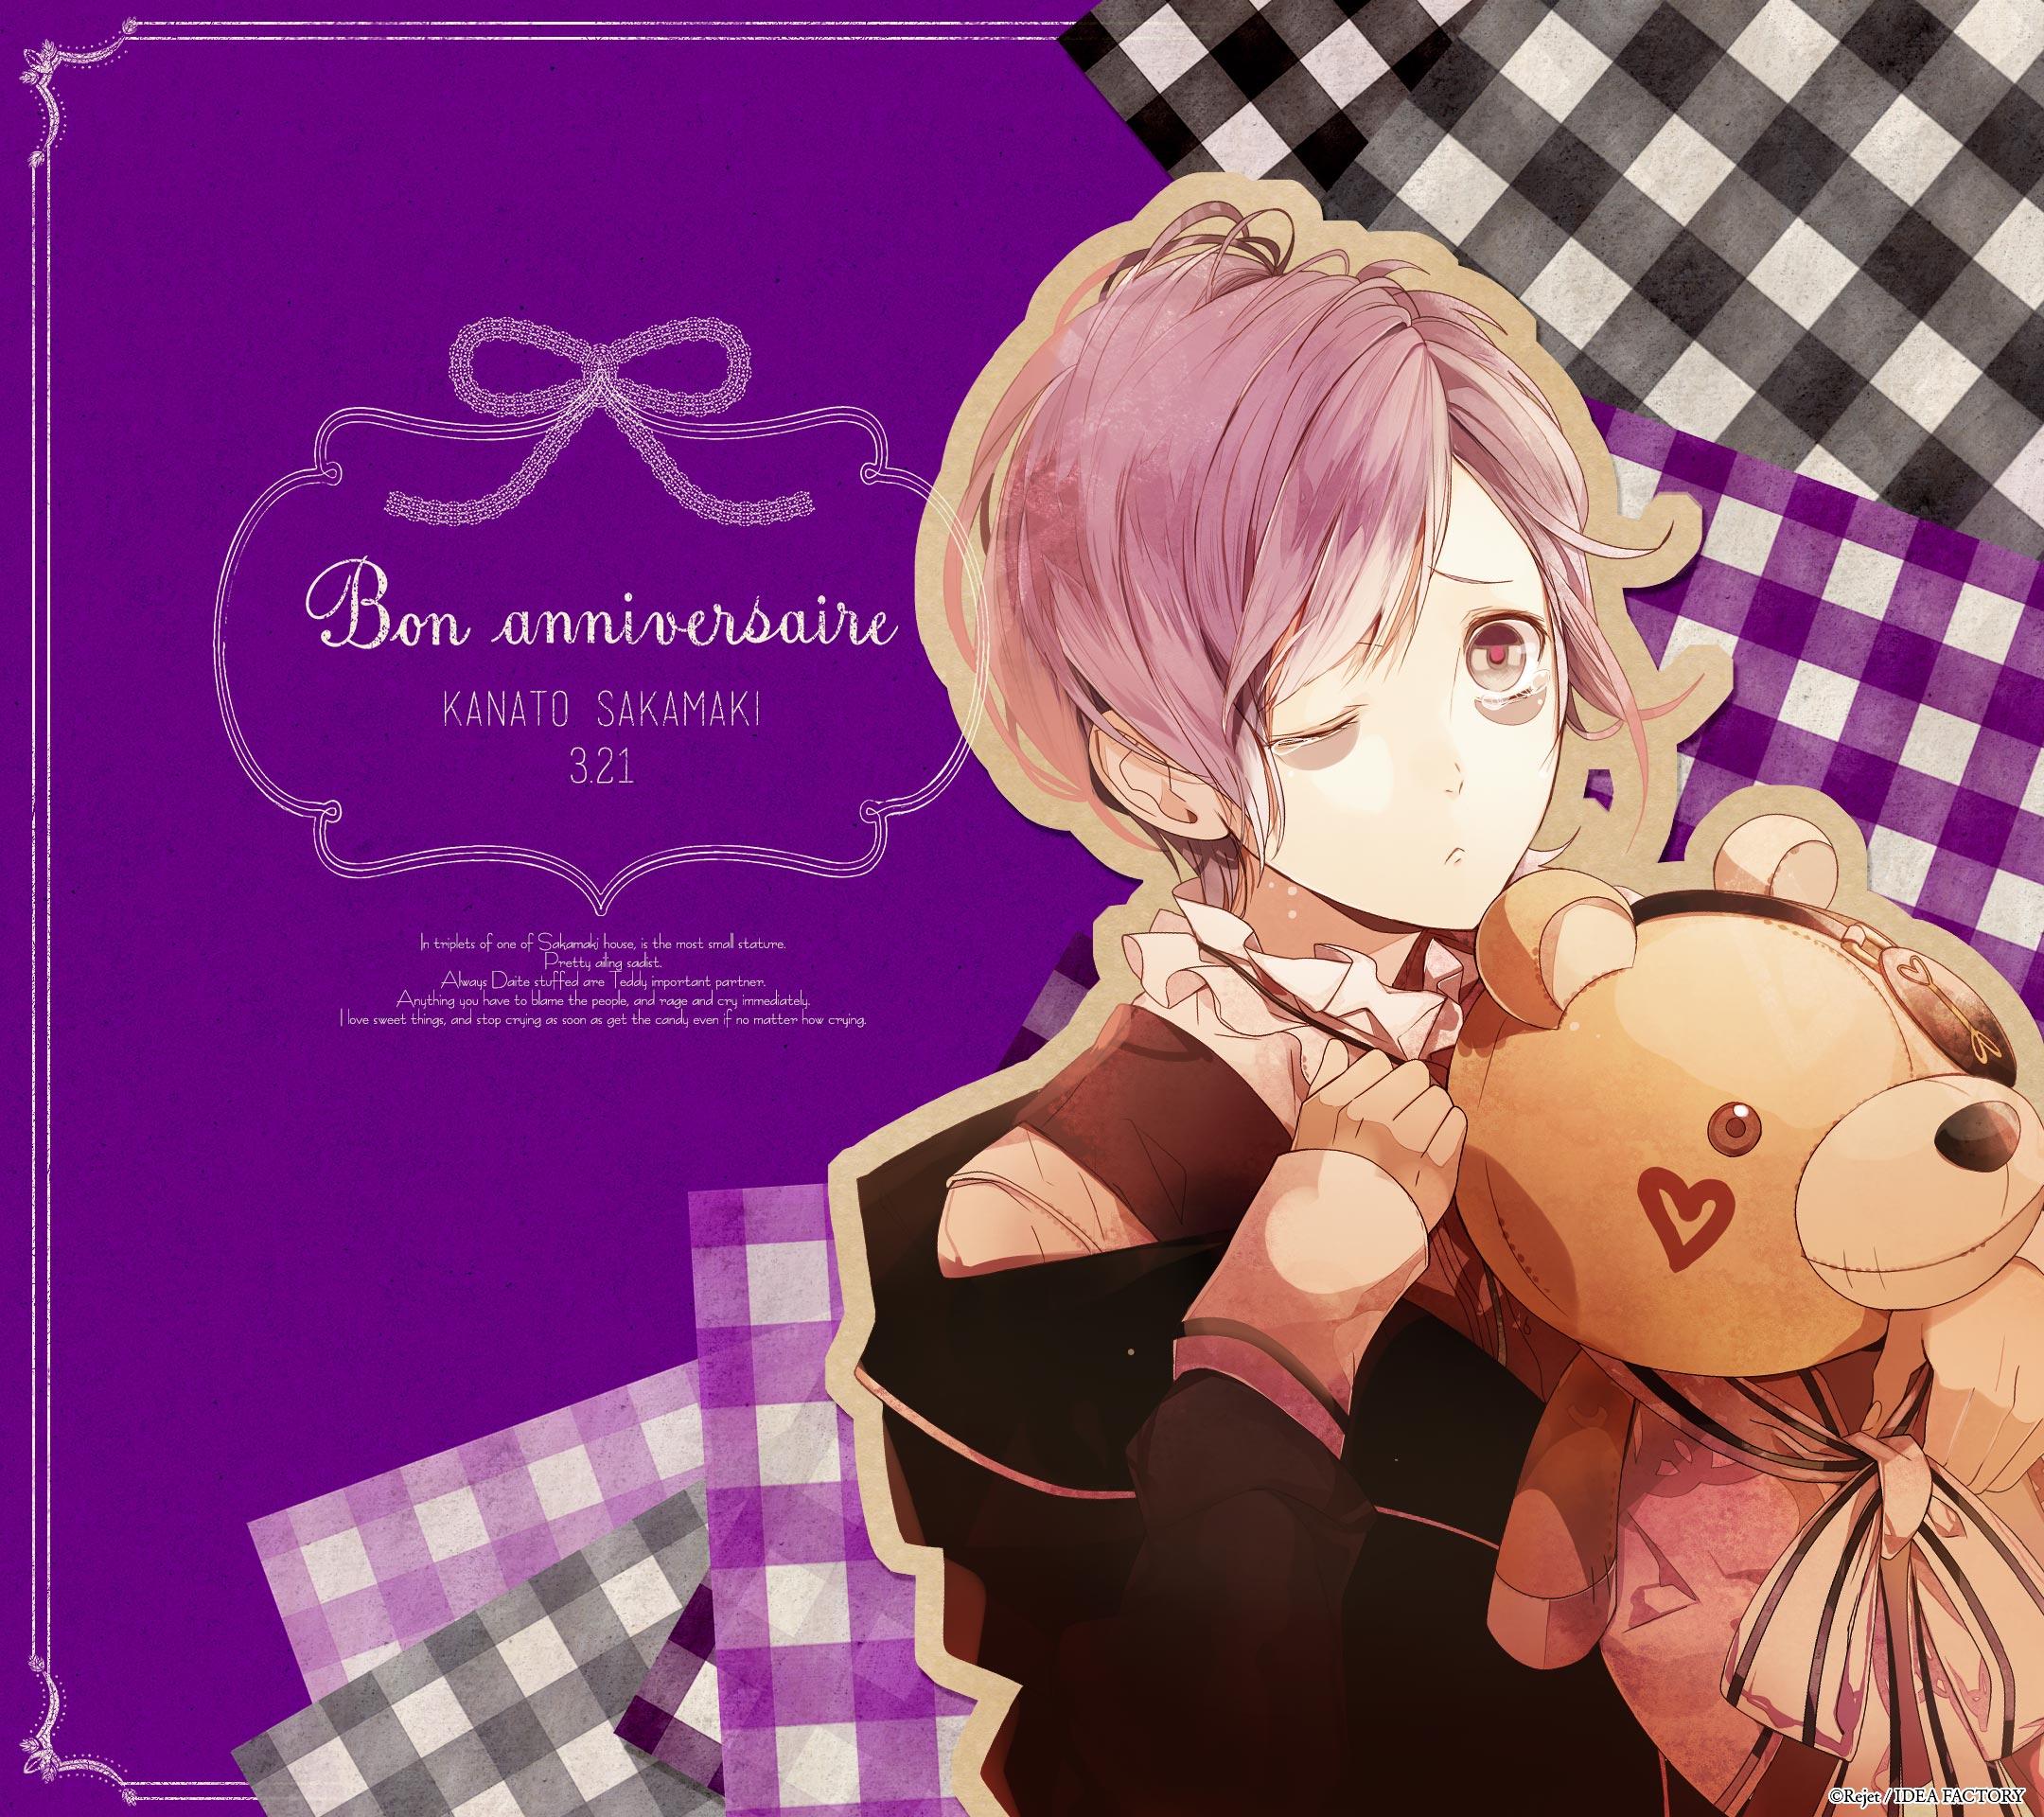 Sakamaki Kanato Diabolik Lovers Haunted Dark Bridal Wallpaper Zerochan Anime Image Board